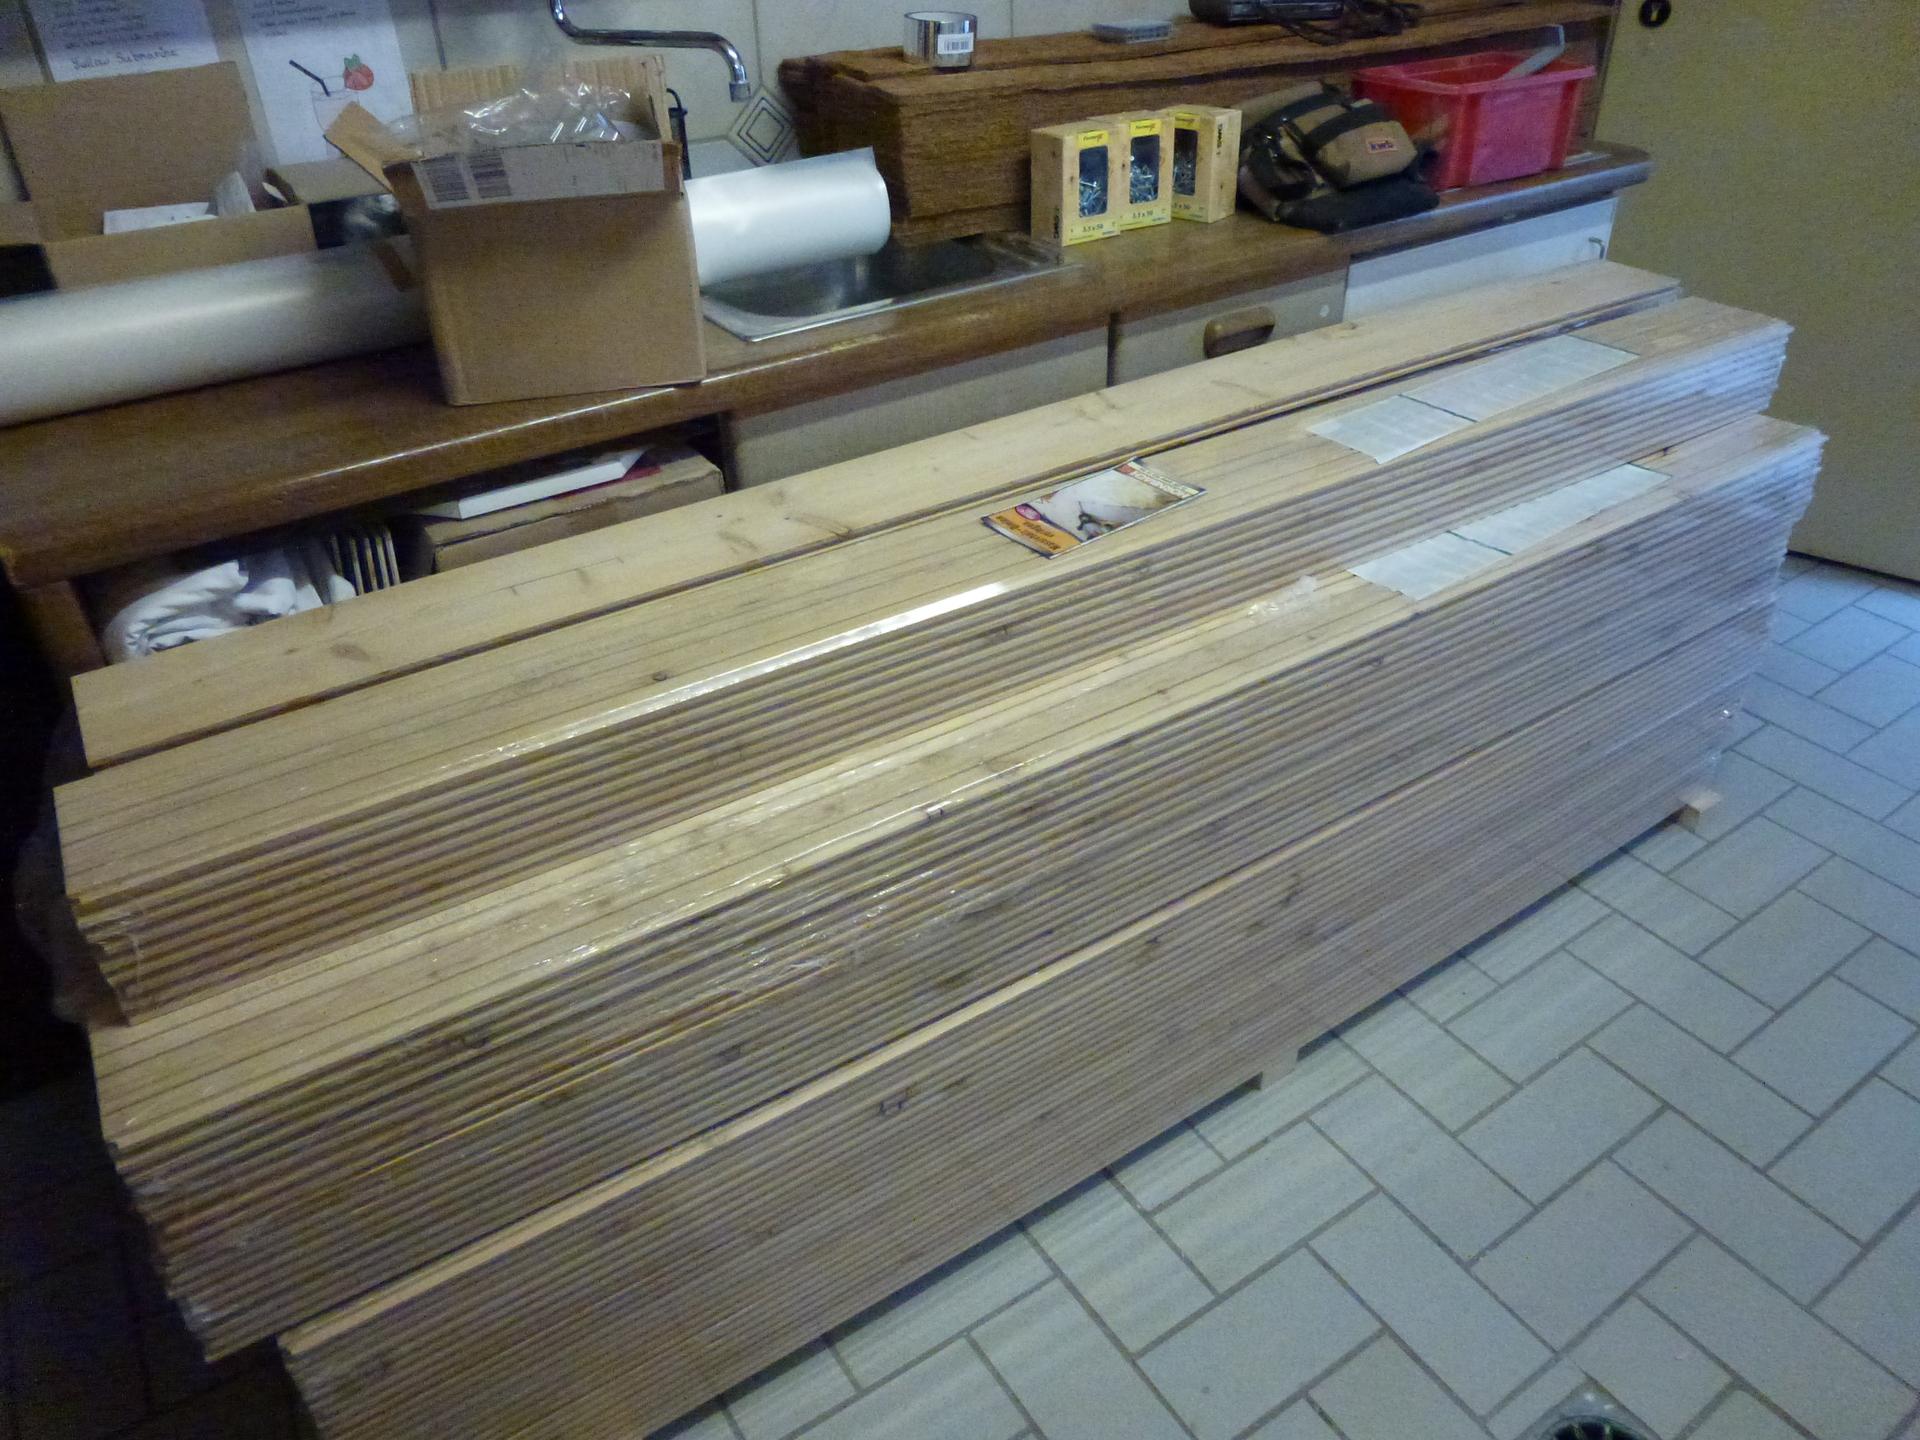 Holzfußboden Dämmen ~ Hk material holzboden und dämmung dämmung hk holzboden material